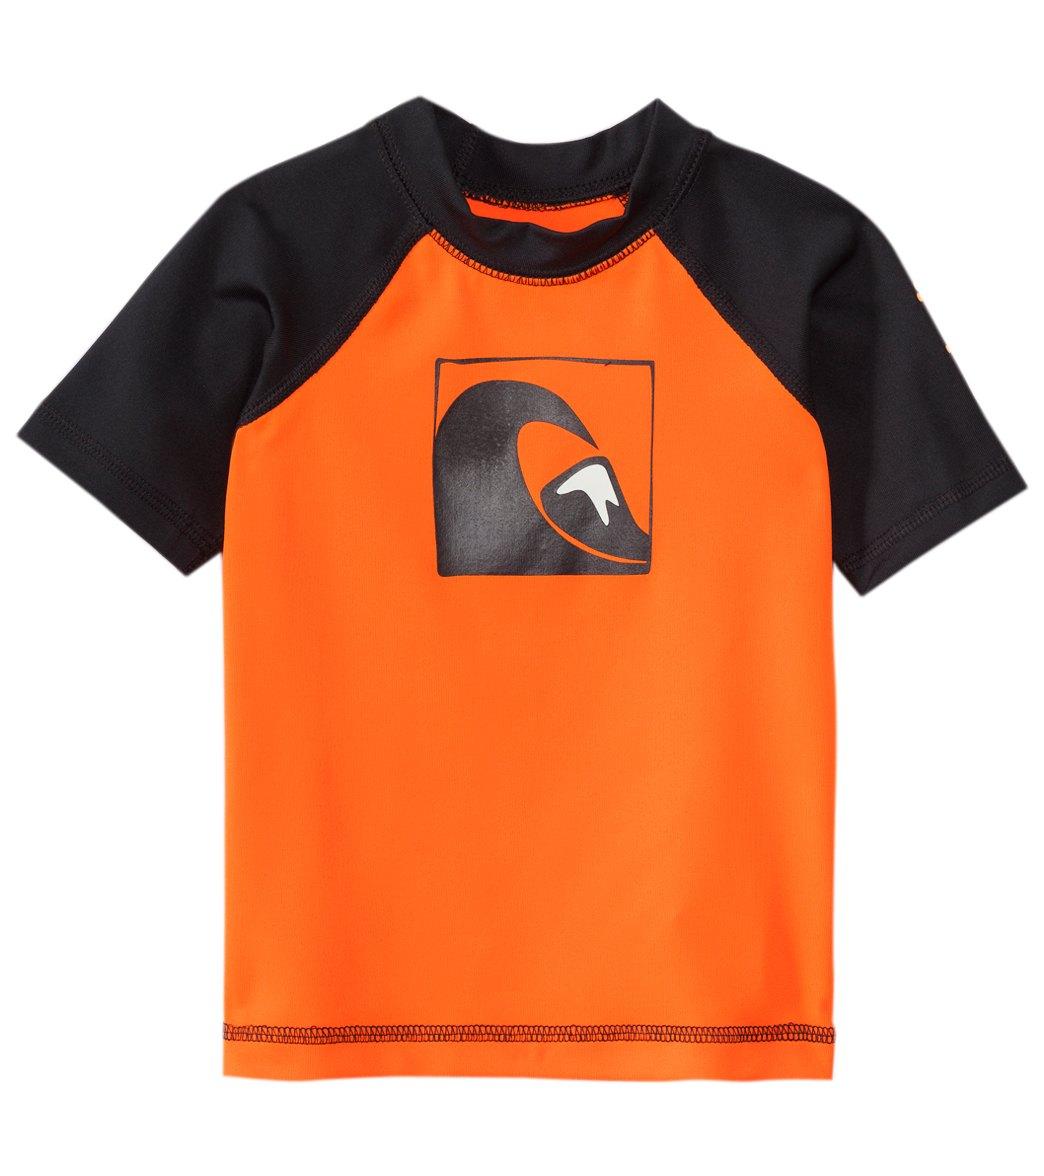 f0aa1823ed ... Quiksilver Infant Boy's Main Peak Short Sleeve Rash Guard. Share